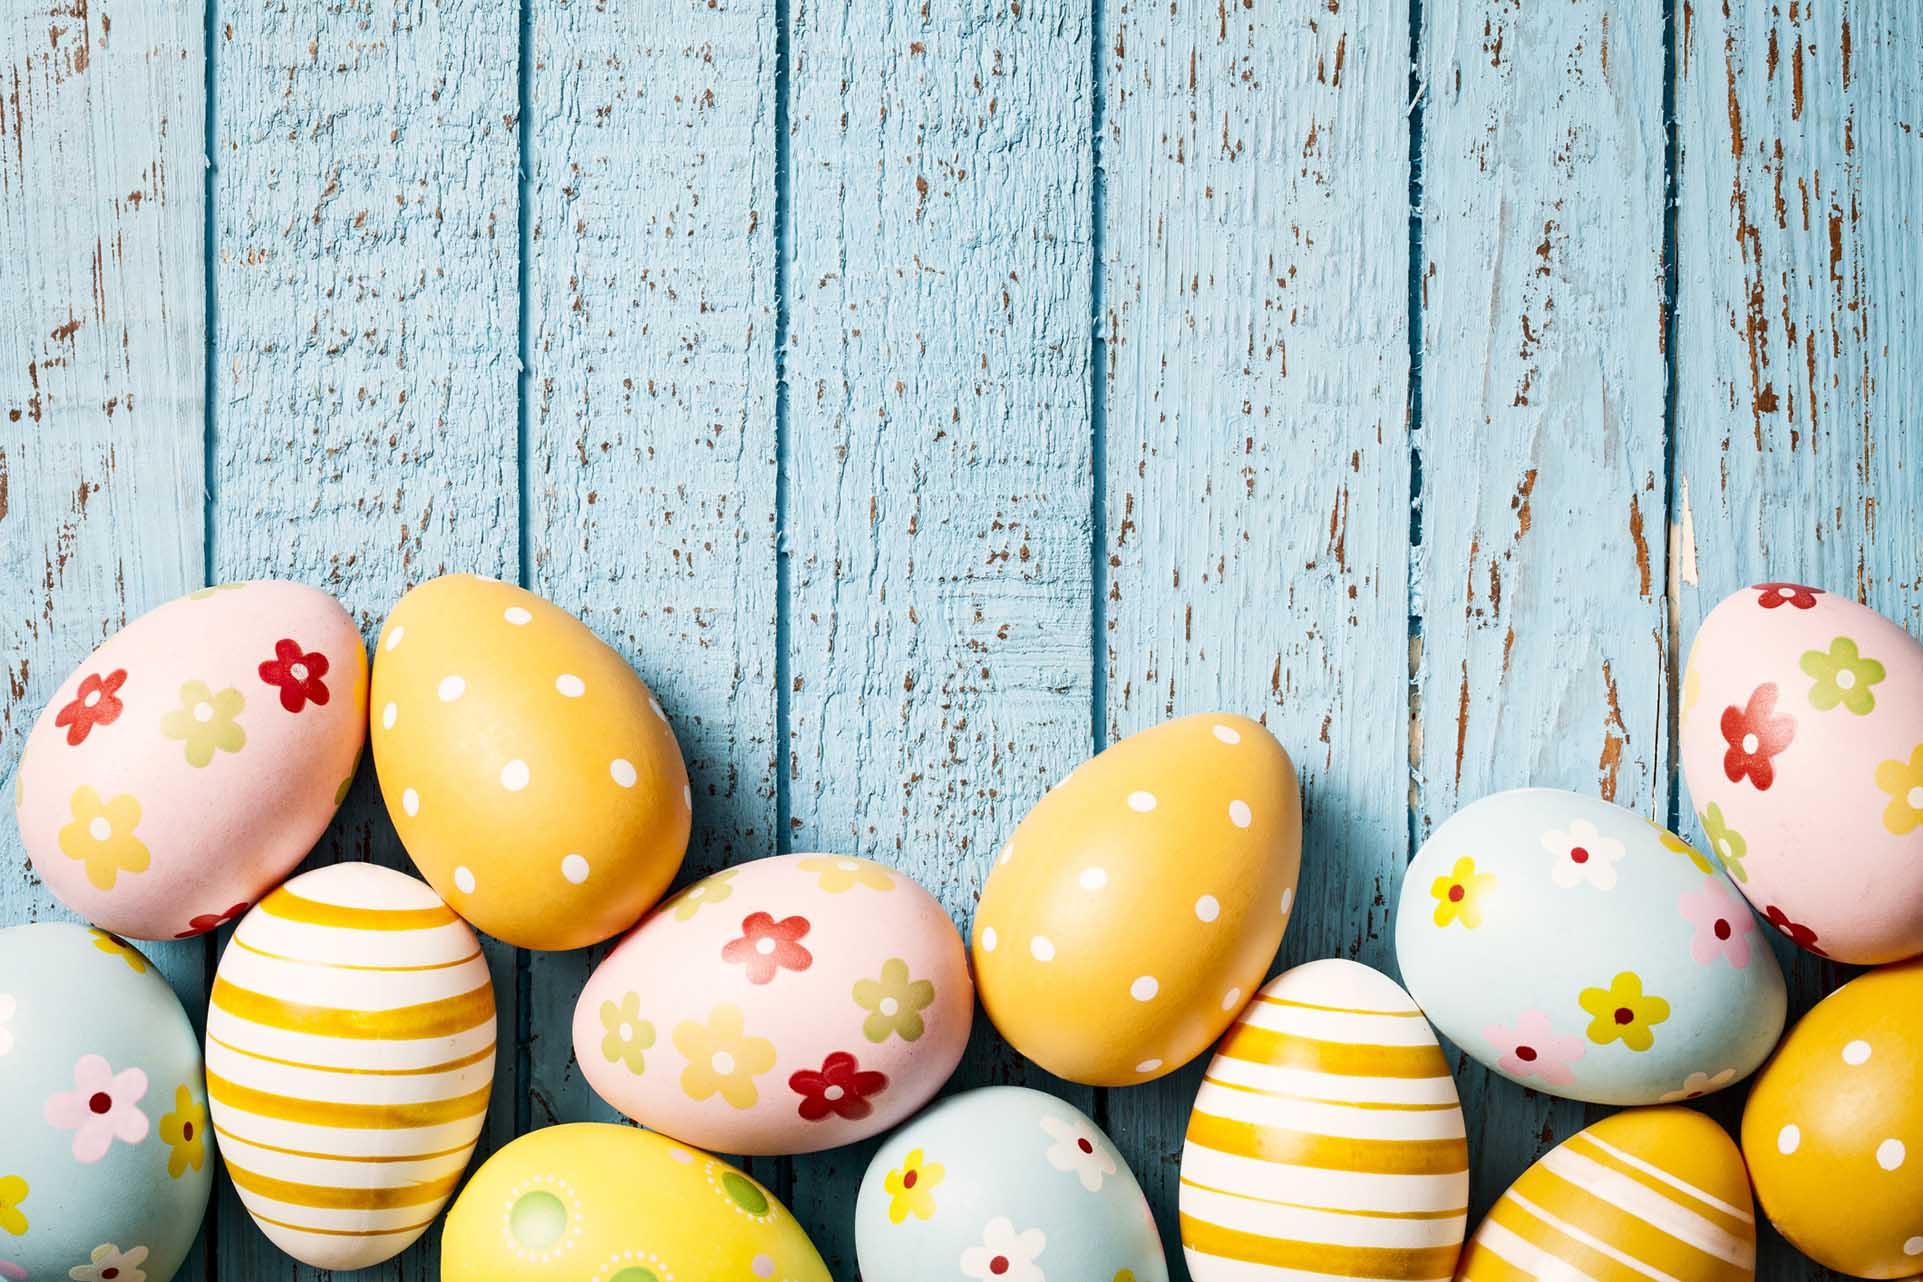 Best Website Easter Eggs Hidden on the Internet